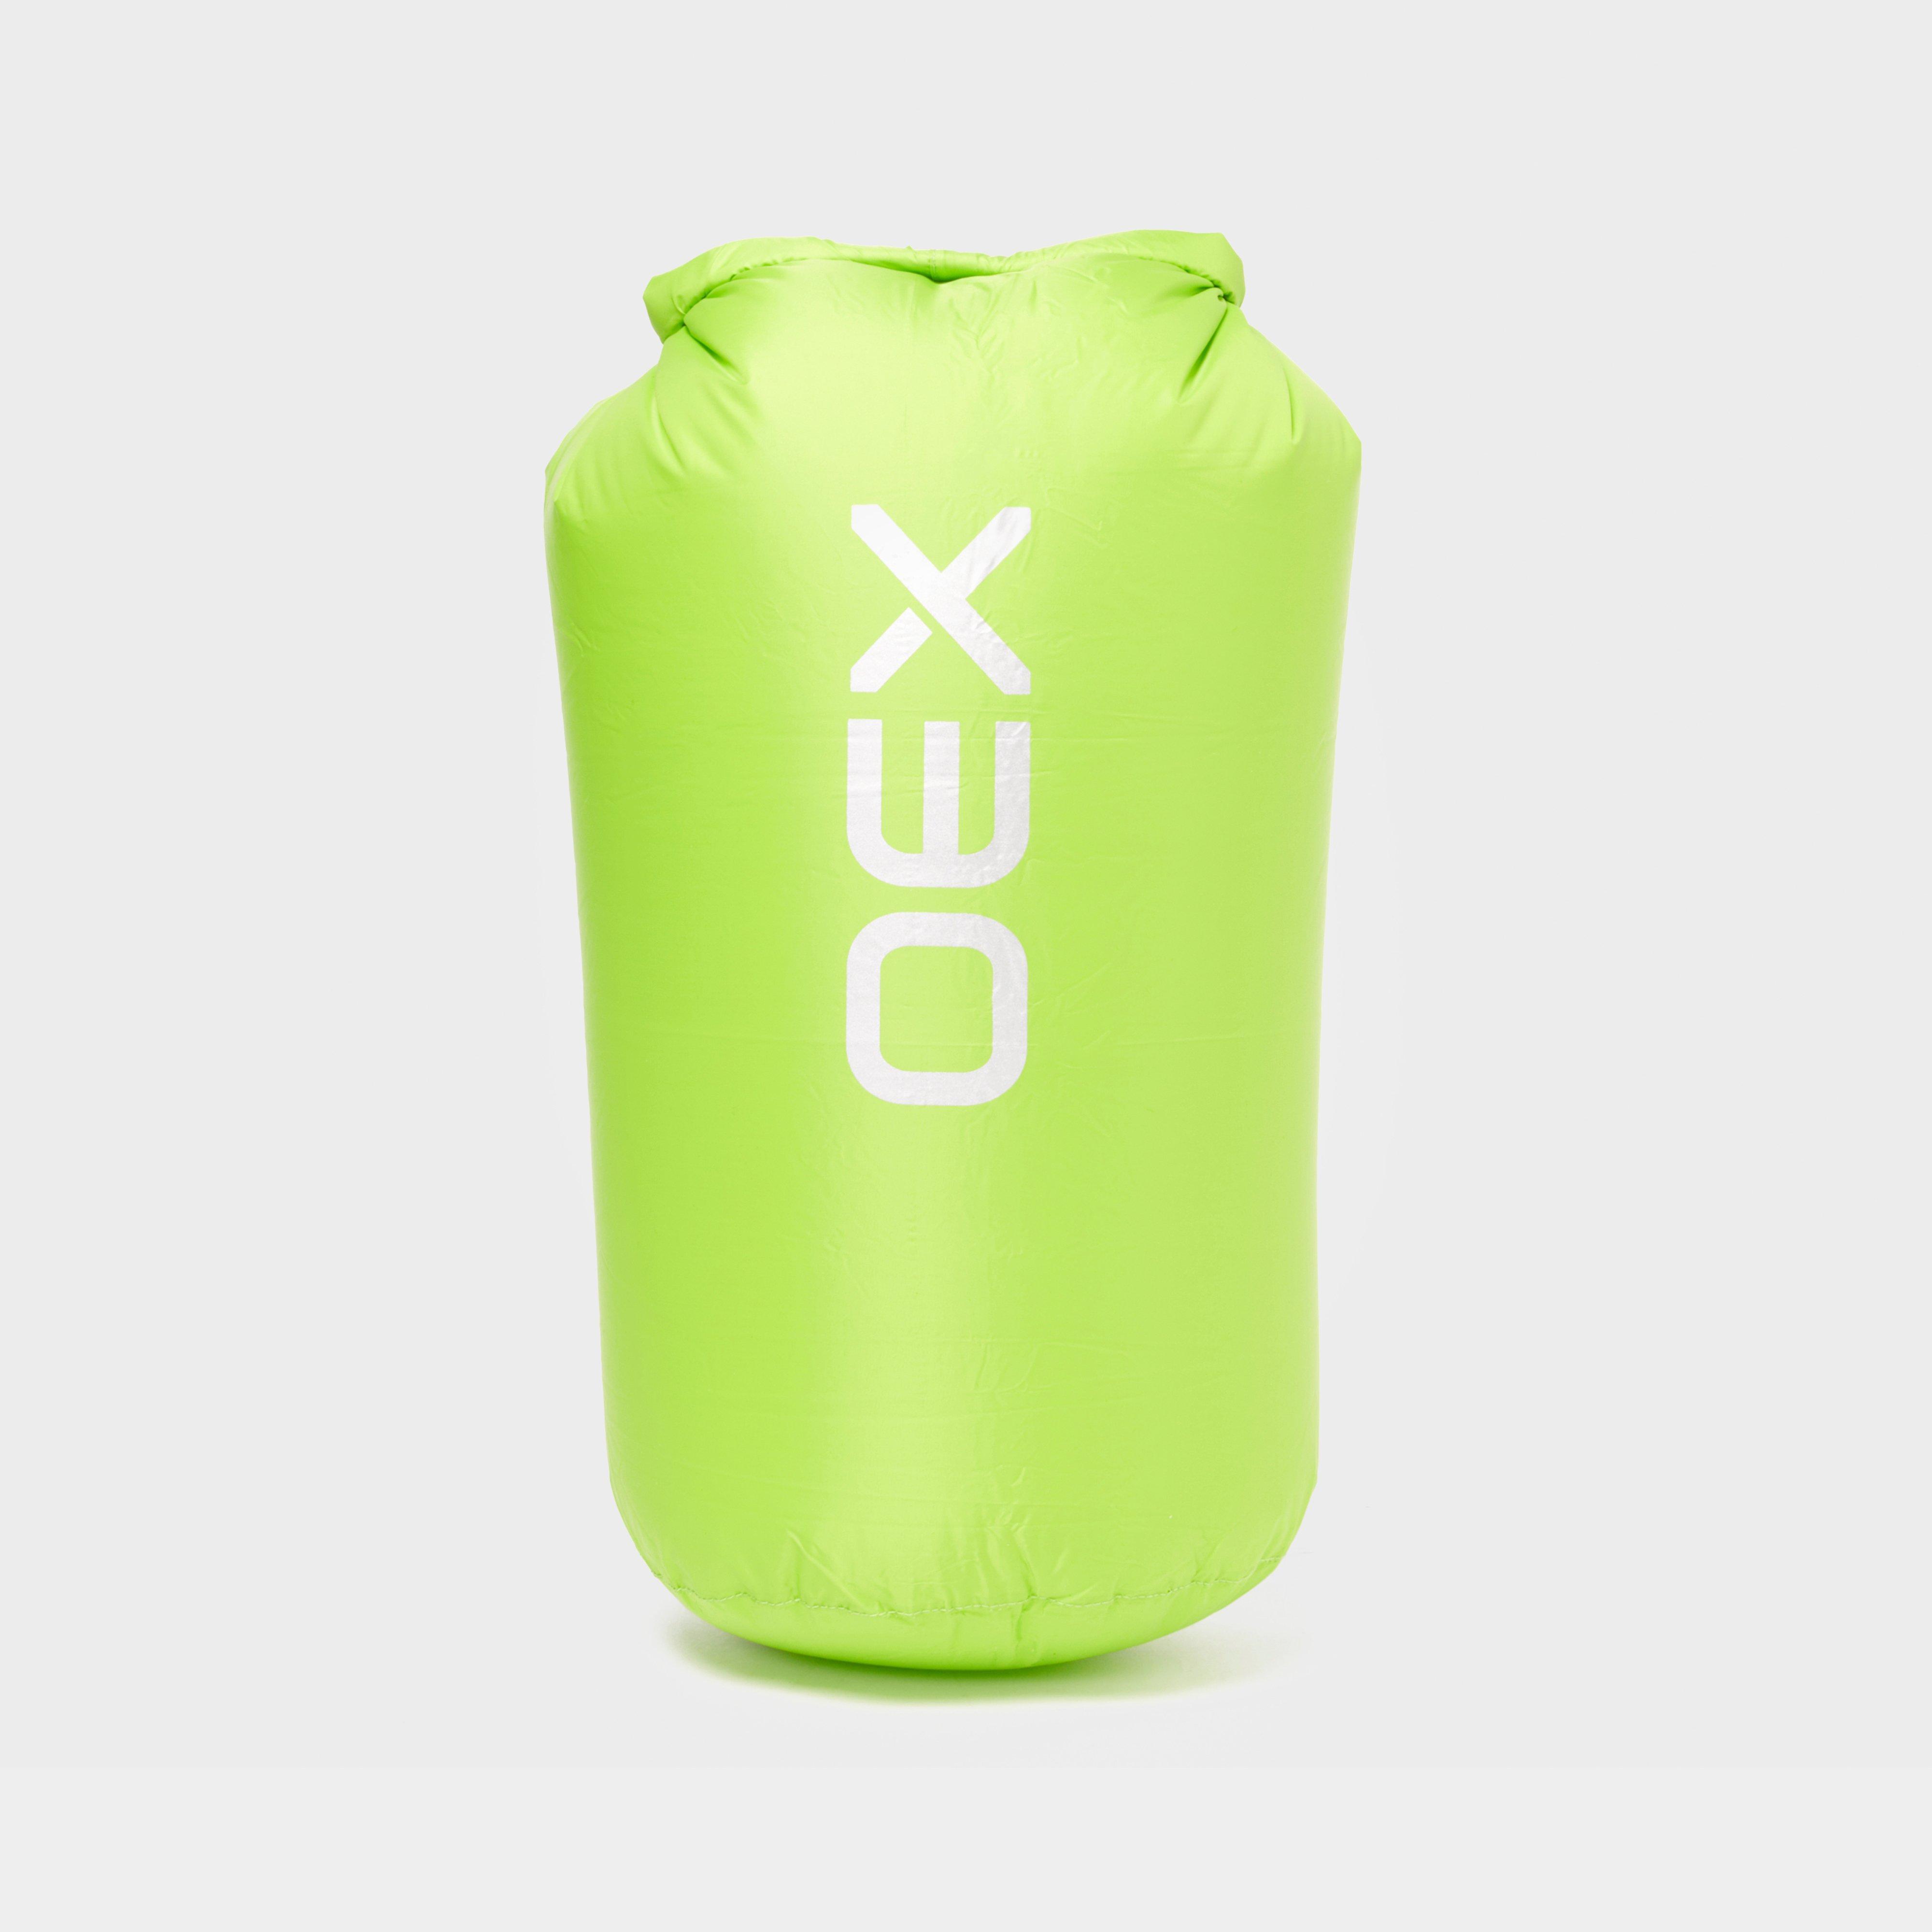 Oex Oex 25 Litre Drysac, Yellow